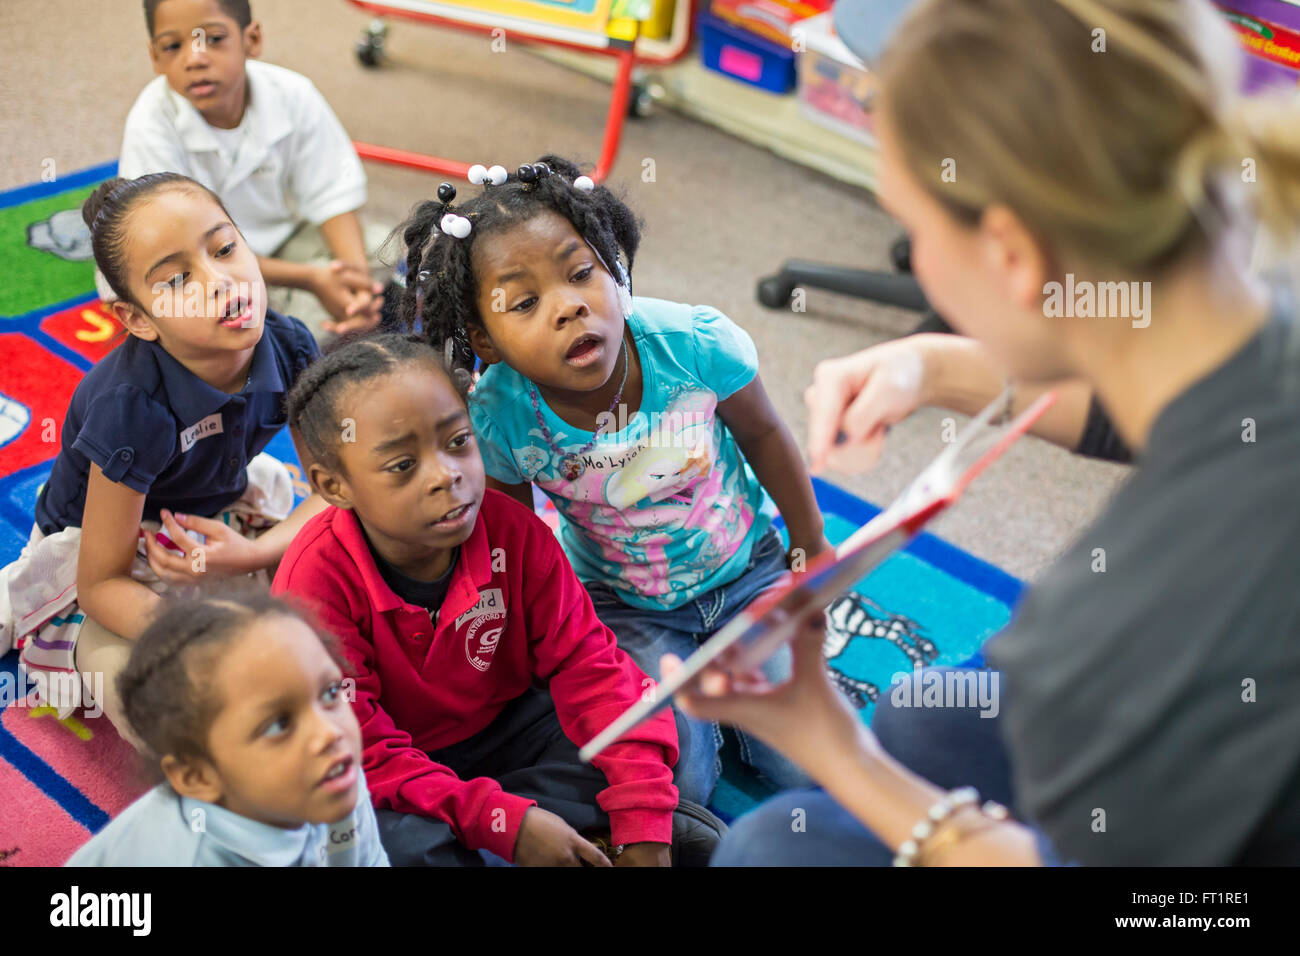 Pontiac, Michigan - Volunteers from Fiat Chrysler read to kindergarten children at Herrington Elementary School. - Stock Image